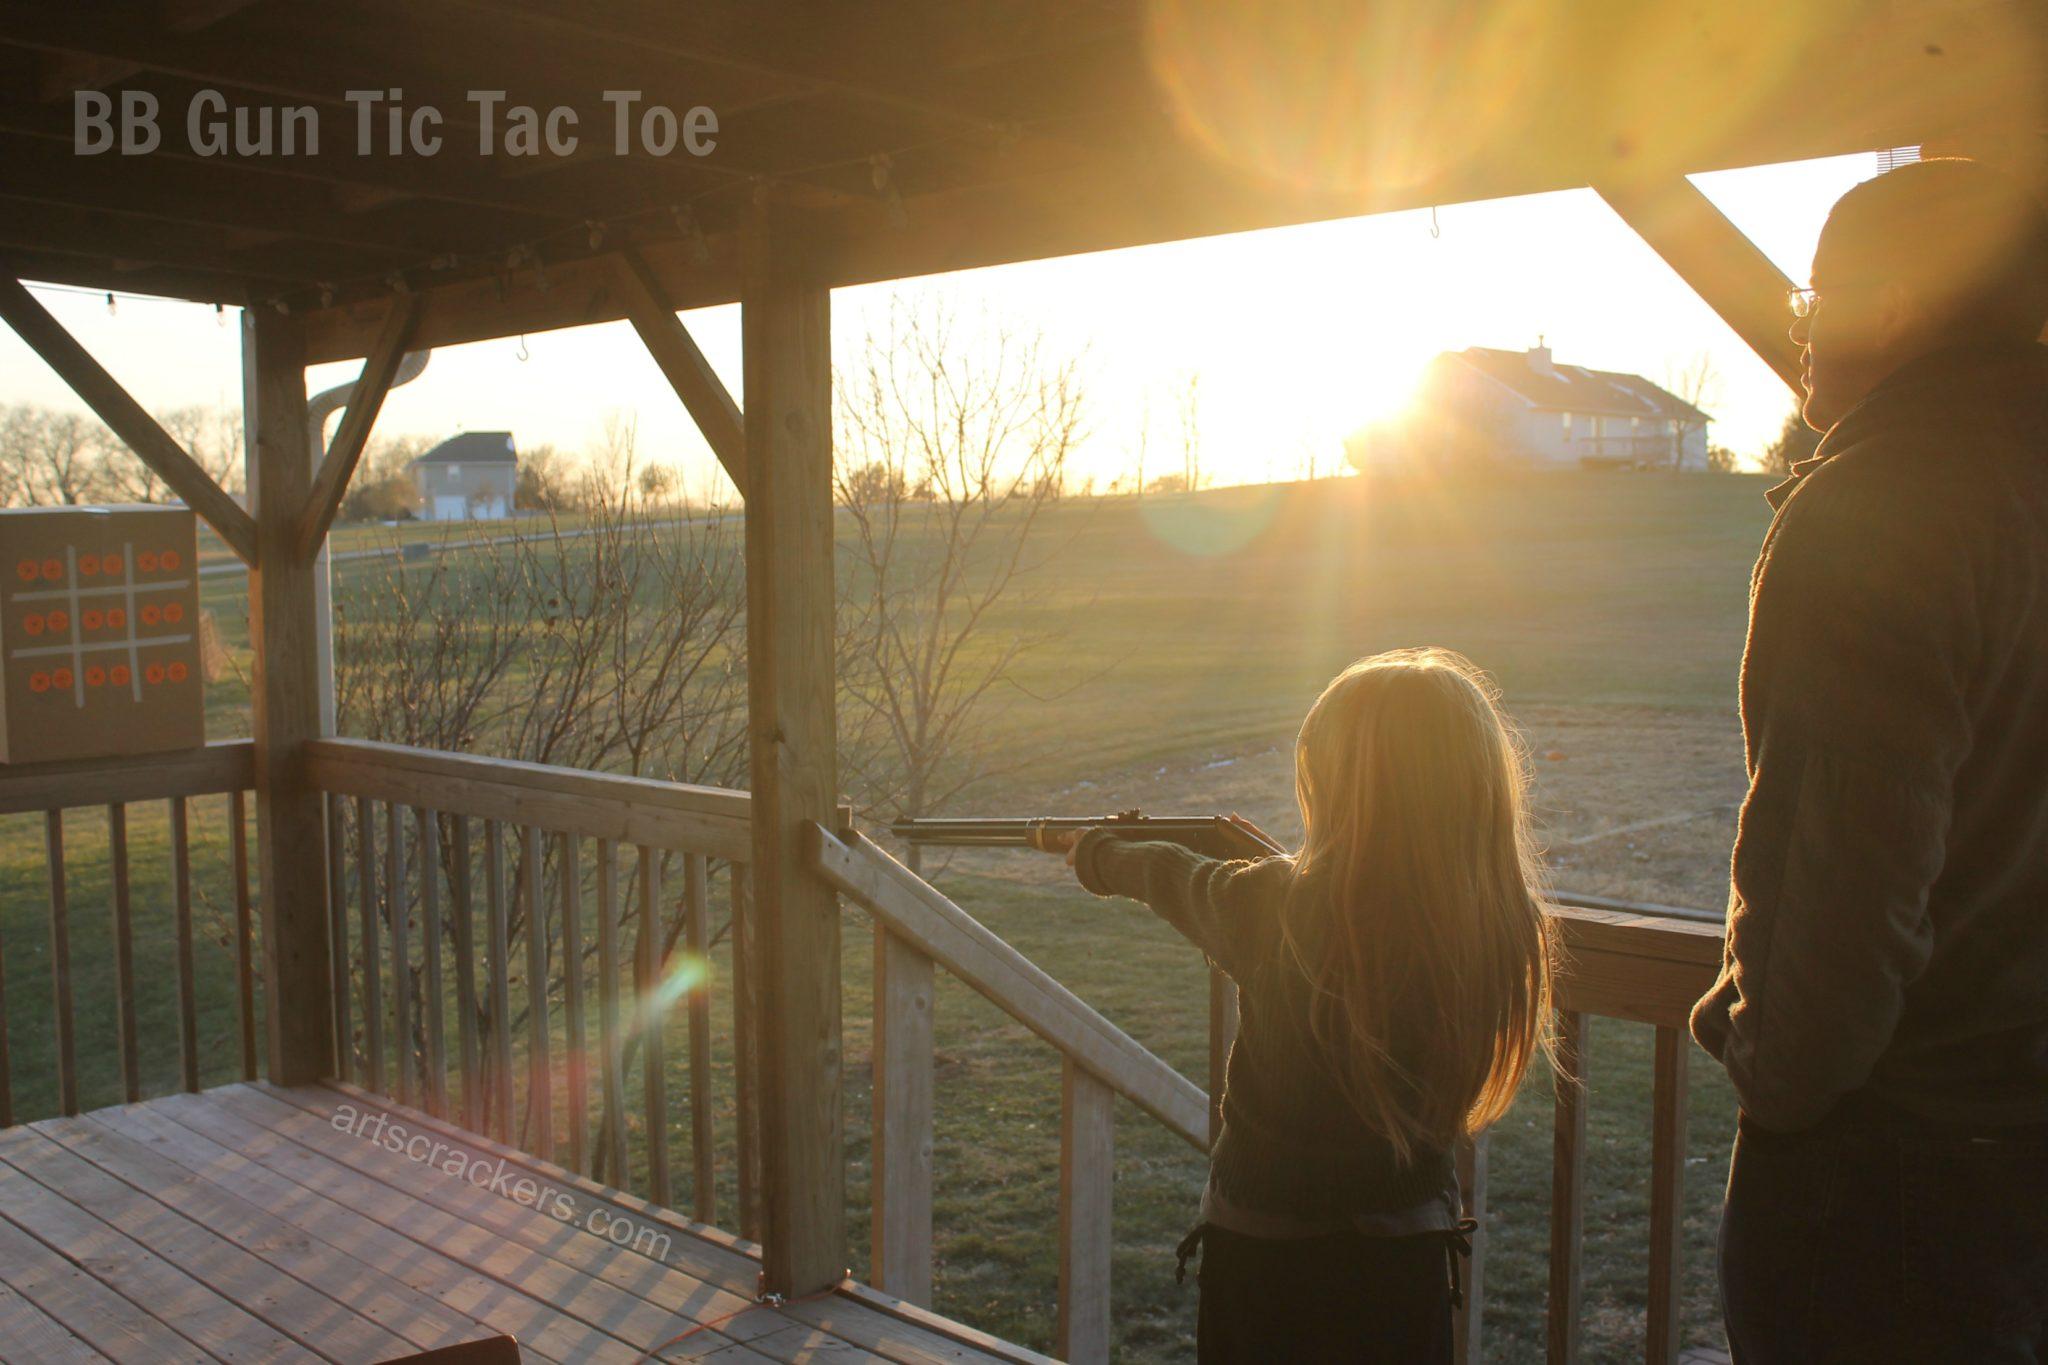 Daisy BB Gun Tic Tac Toe